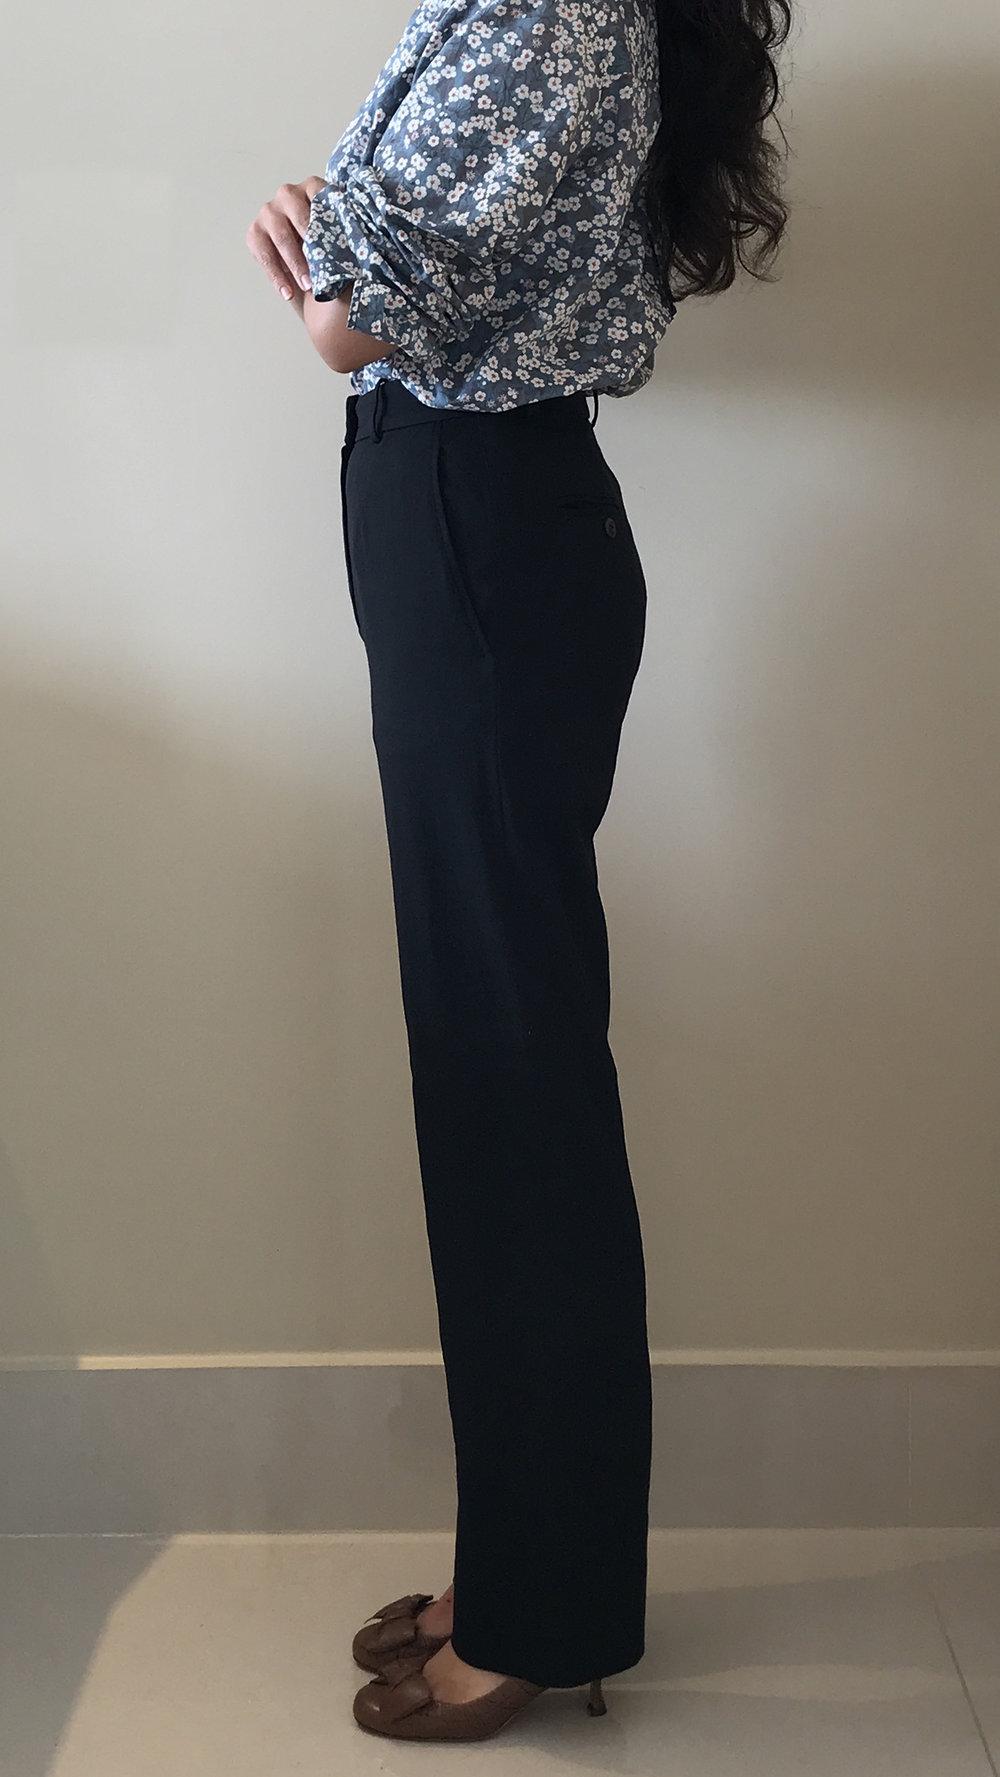 YSL-trousers-side.jpg